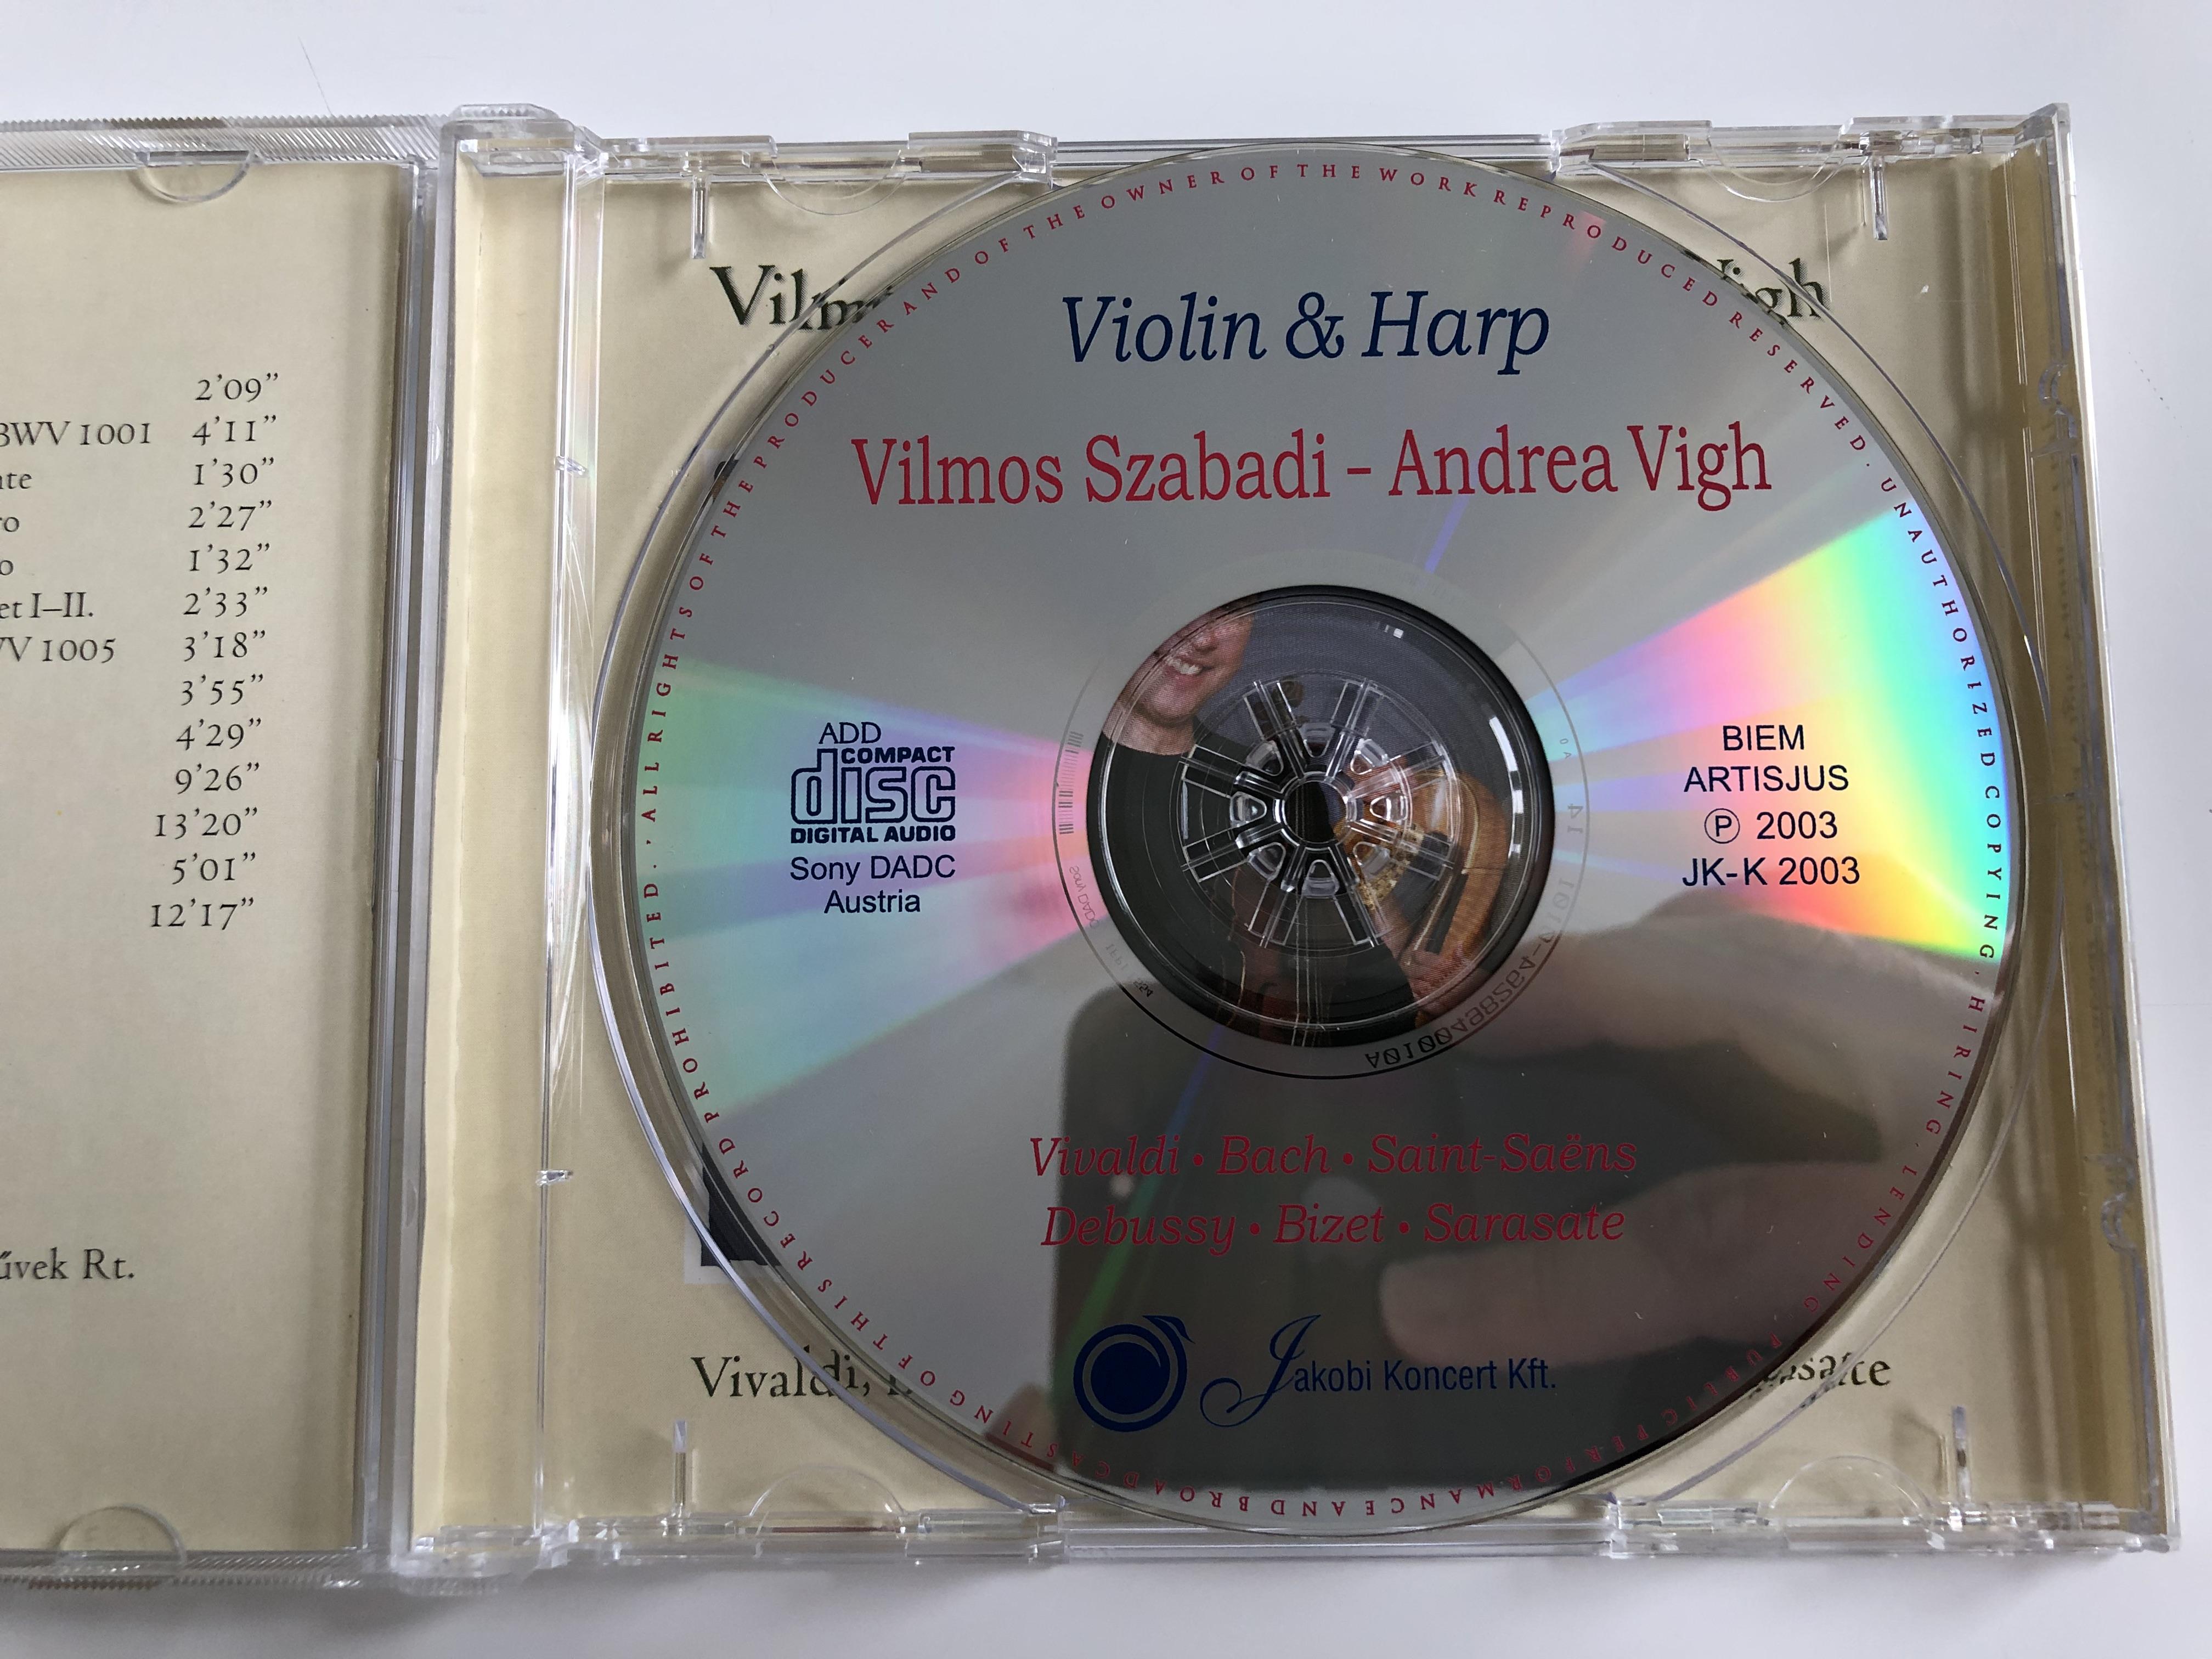 vilmos-szabadi-violin-andrea-vigh-harp-vivaldi-bach-saint-saens-debussy-bizet-sarasate-jakobi-koncert-kft.-audio-cd-2003-jk-k-2003-6-.jpg